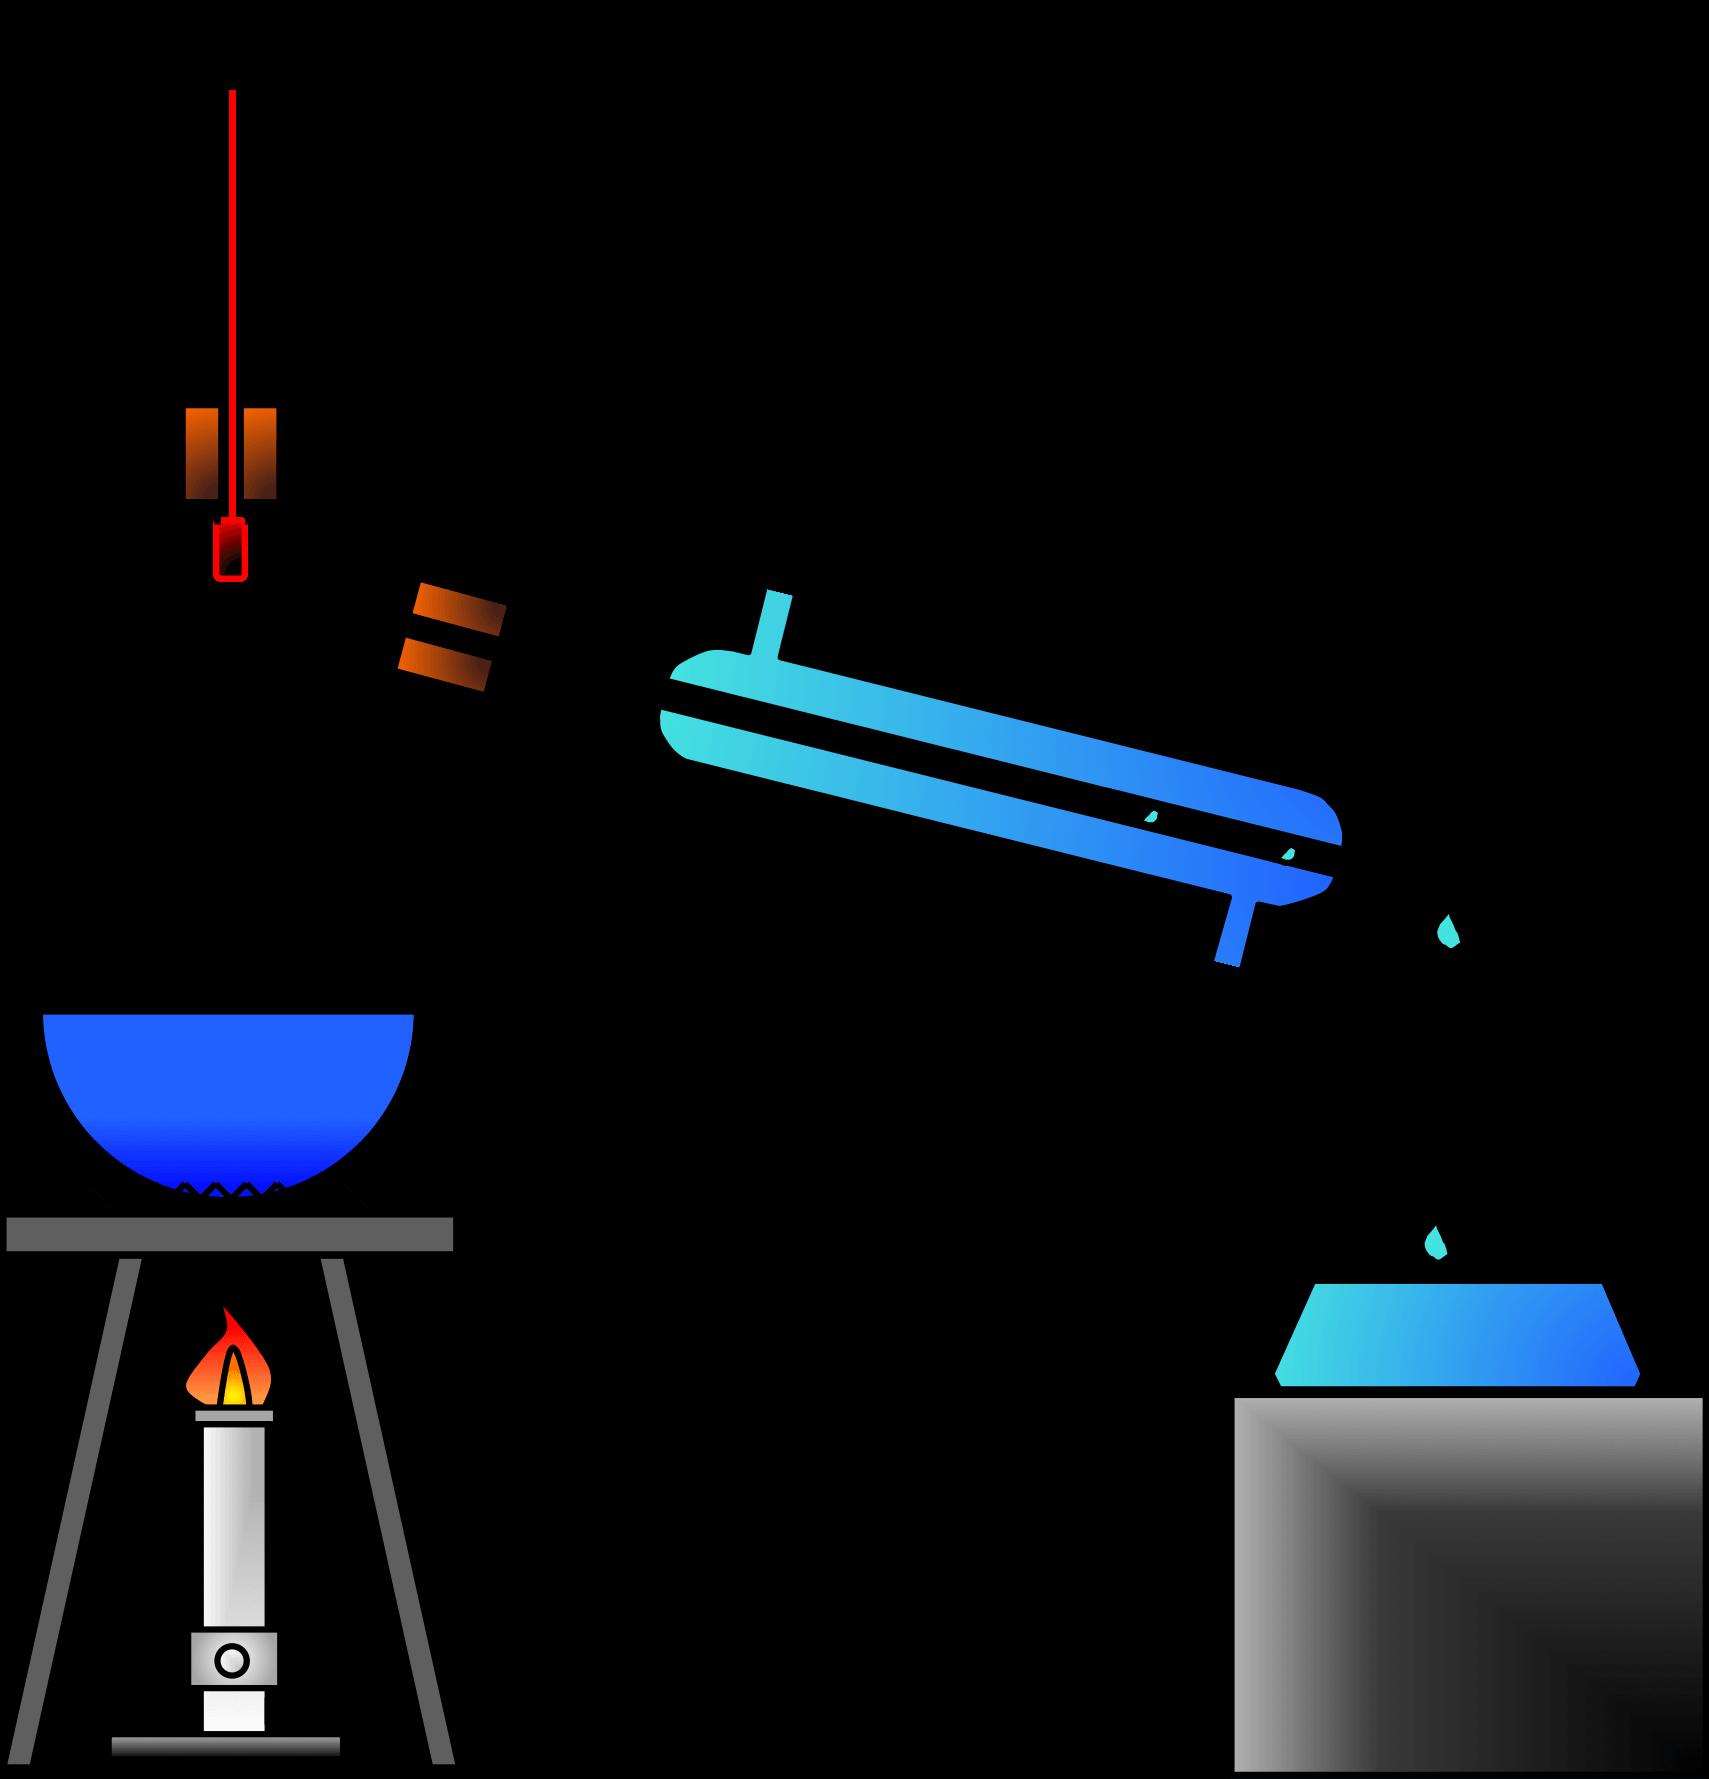 Liquids: Simple Distillation, Fractional Distillation, and Gas Chromatography